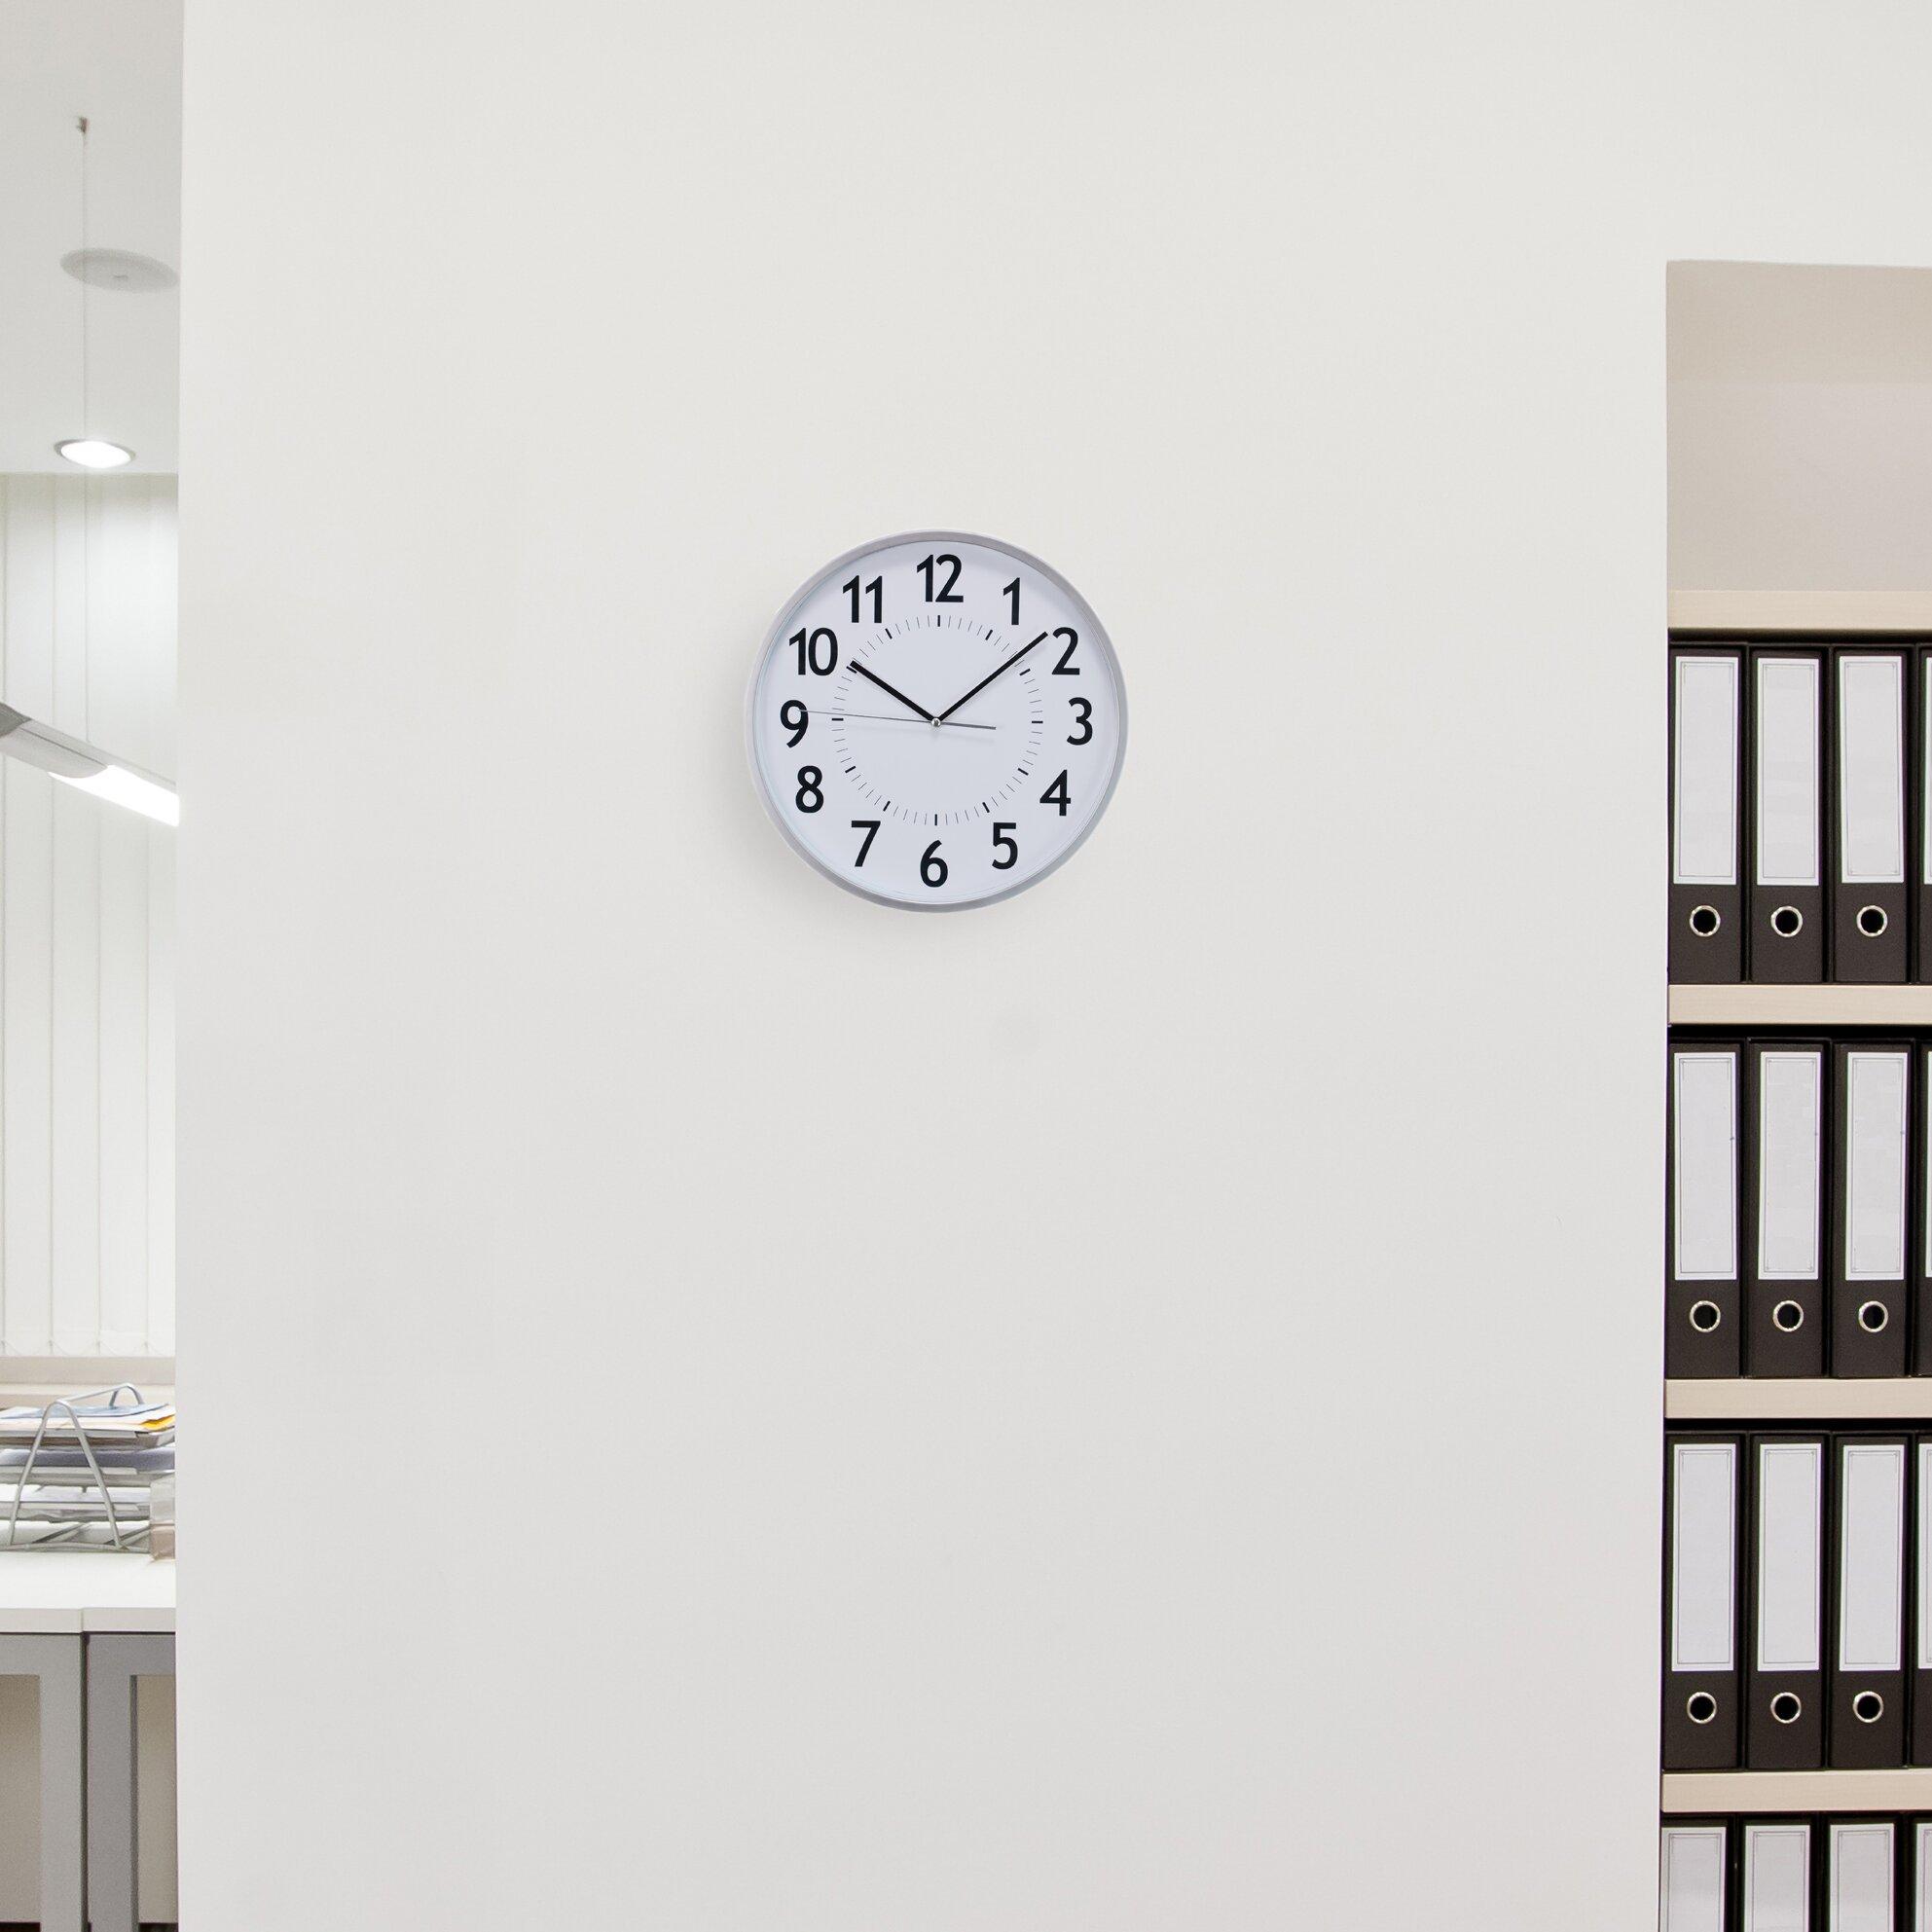 Wall Grace Design : Nexxt design kiera grace quot synchro silent wall clock